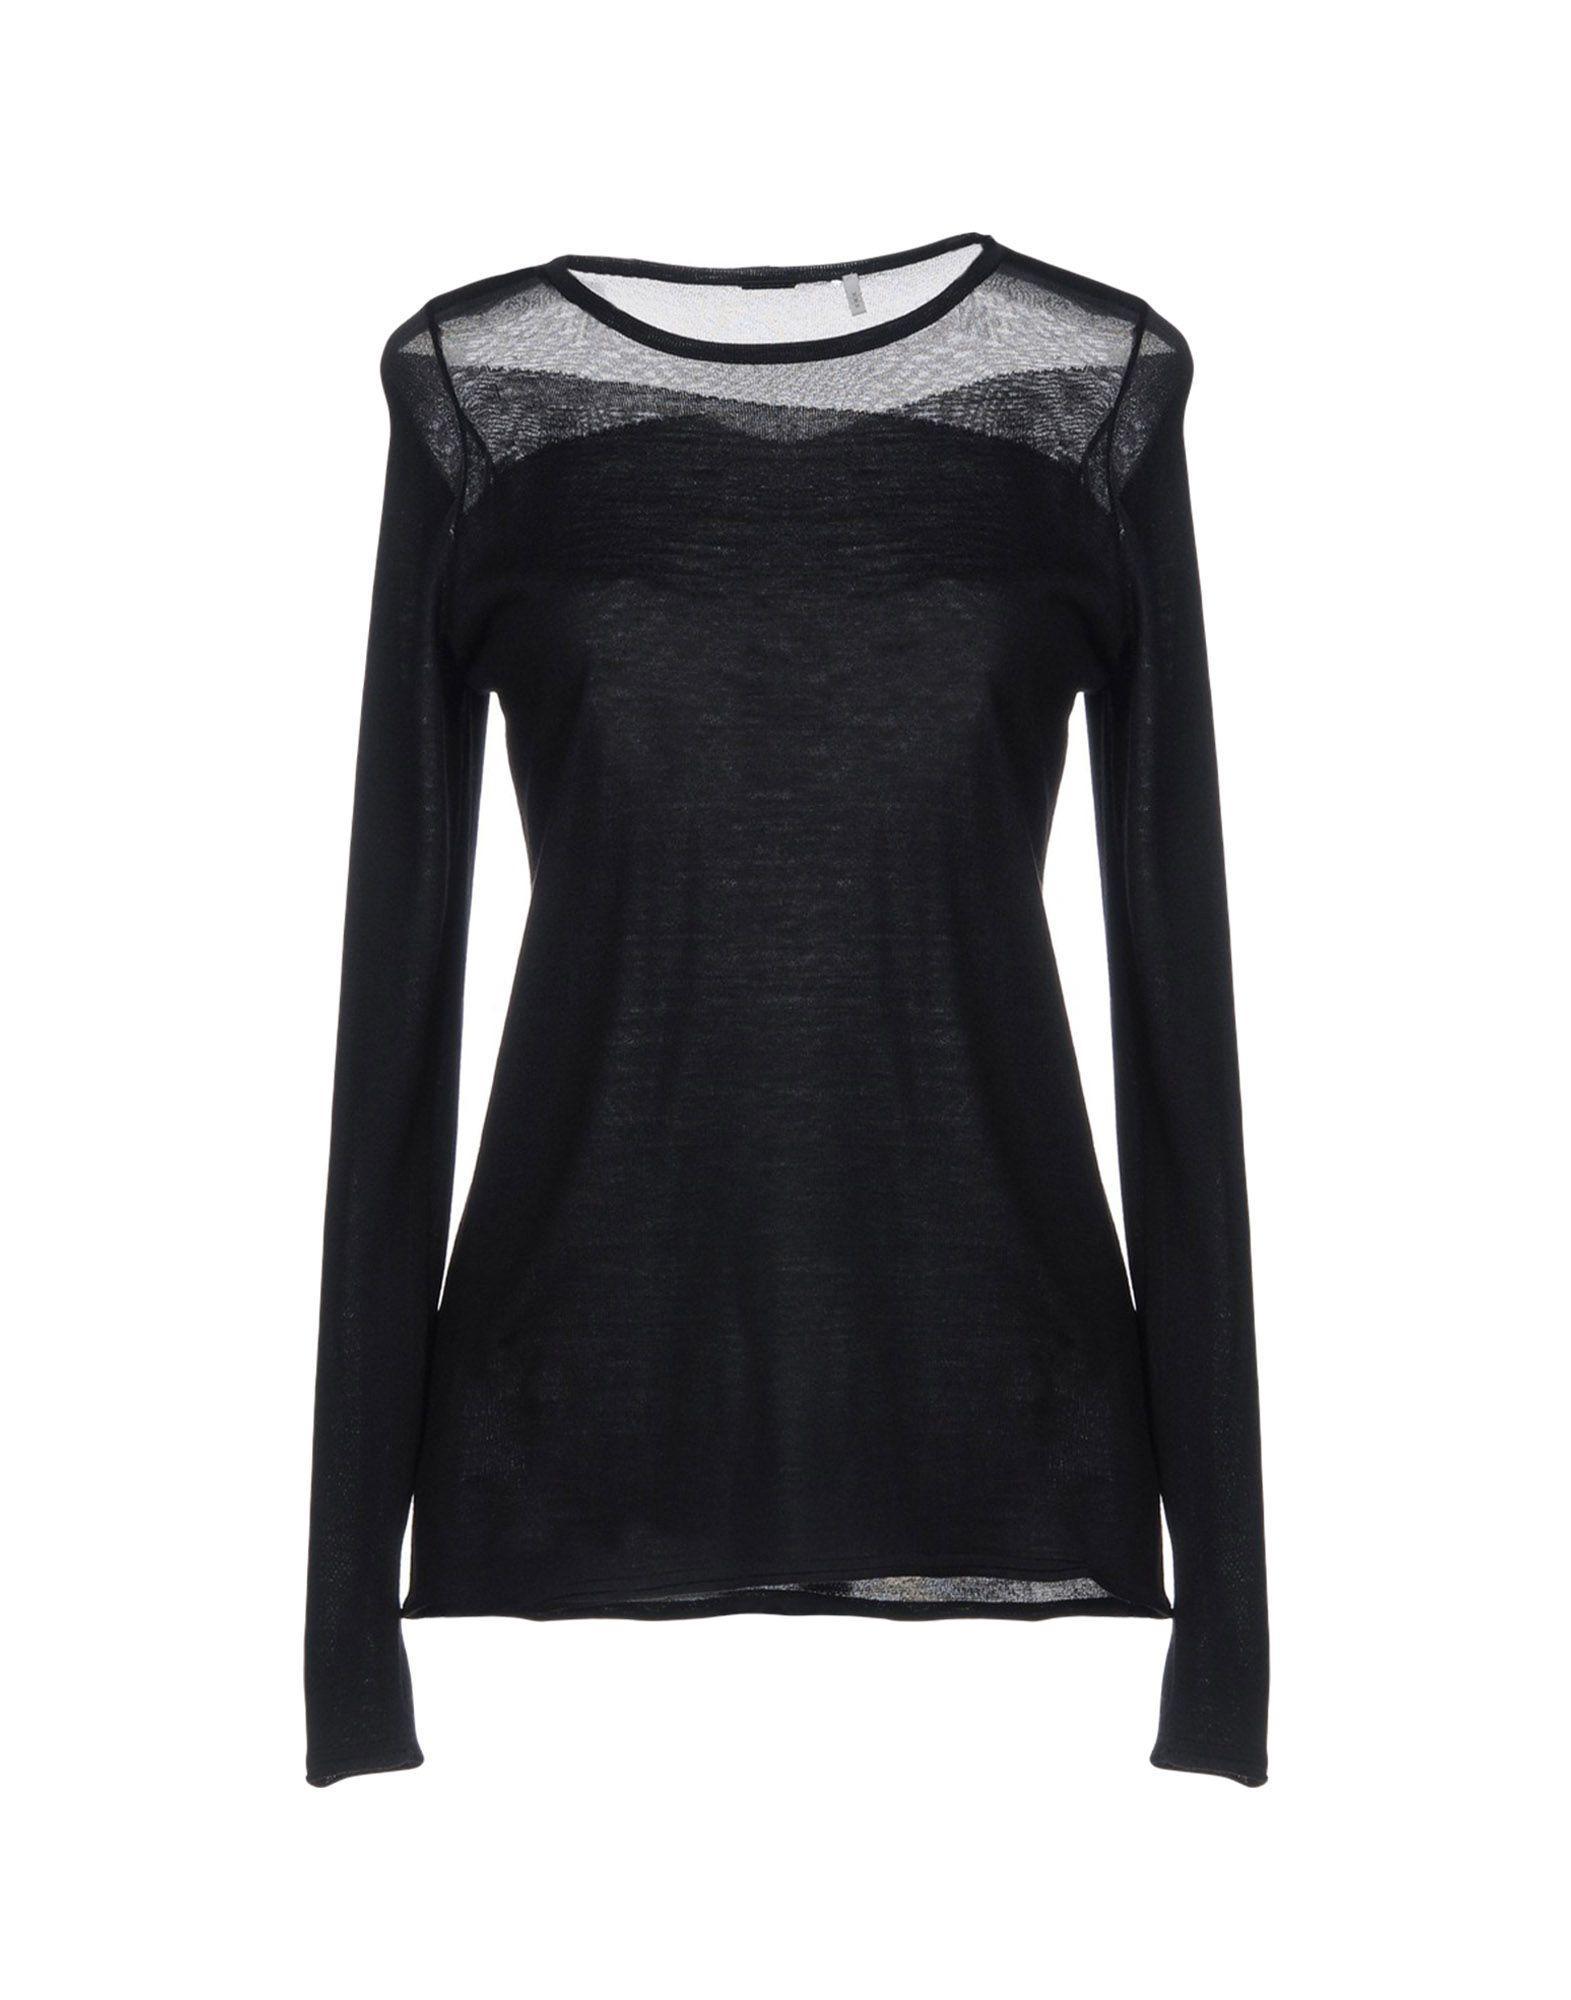 Elie Tahari Sweater In Black